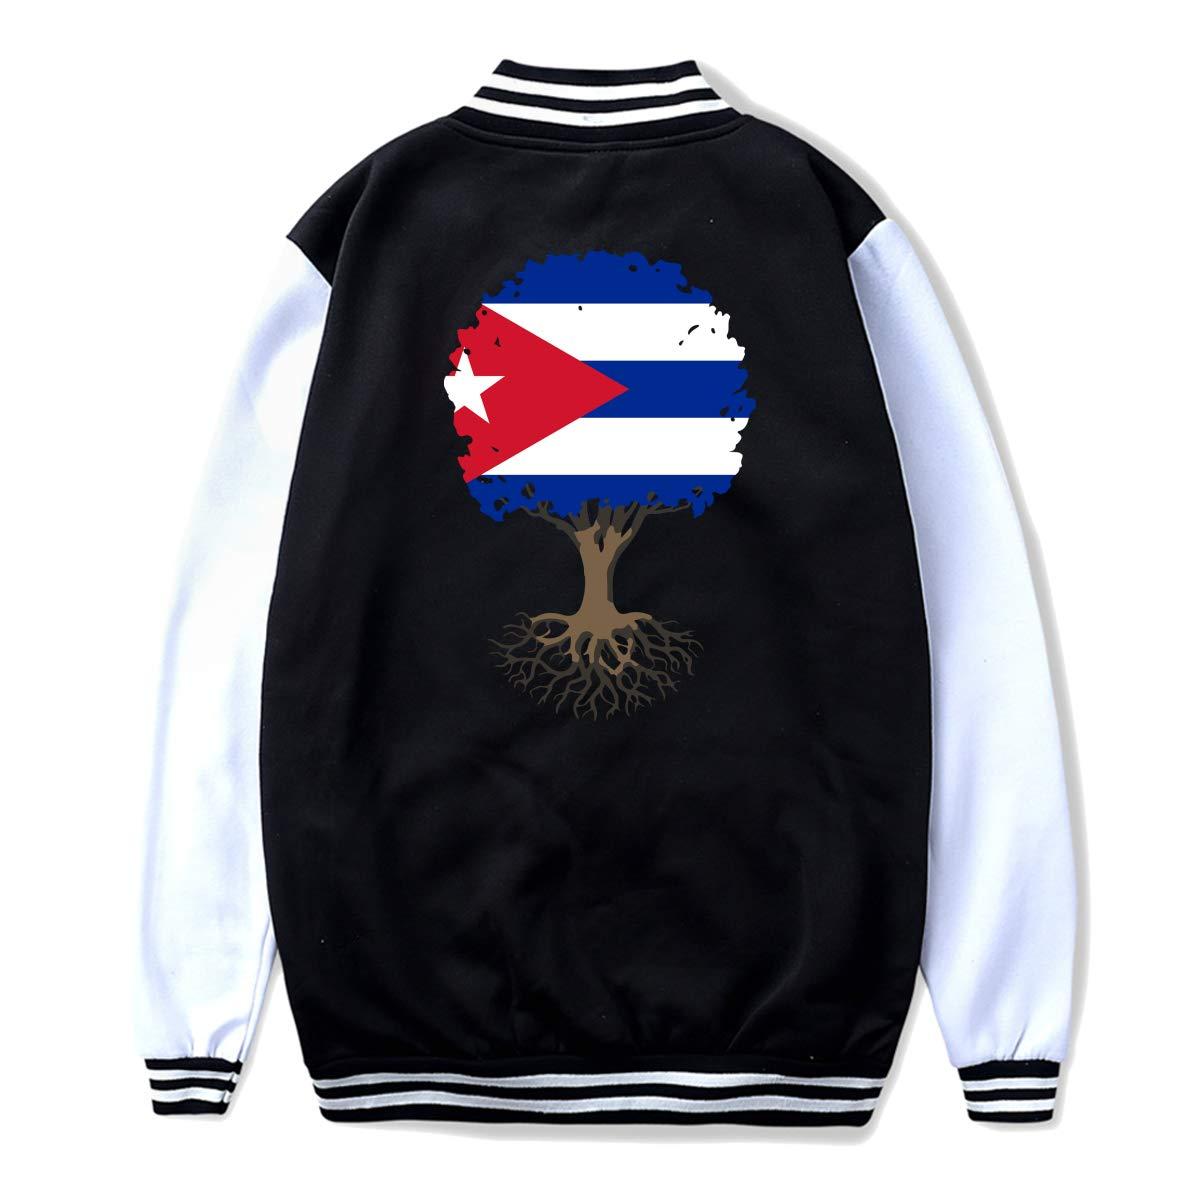 NJKM5MJ Unisex Teen Baseball Uniform Jacket Tree of Life with Cuba Flag Sweater Sport Coat Back Print